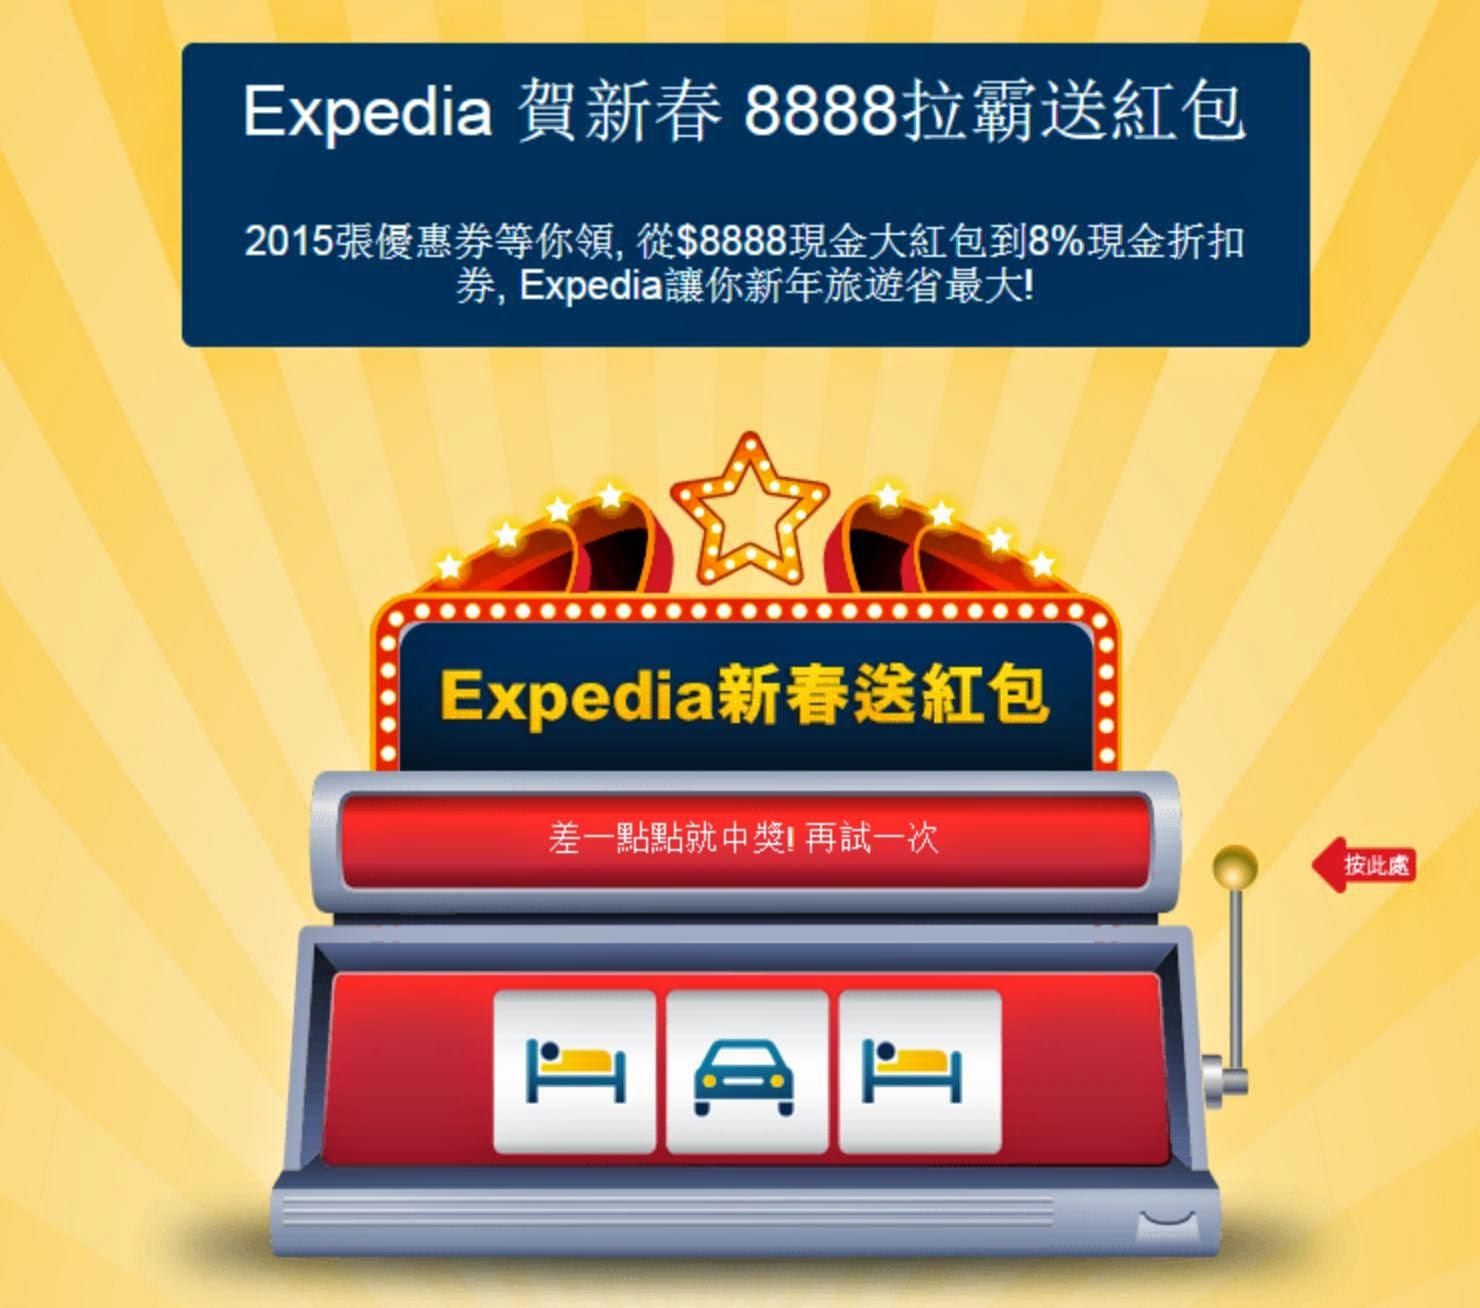 Expedia台灣站 - 賀新春【 8888拉霸送紅包】,只限2015張優惠碼!